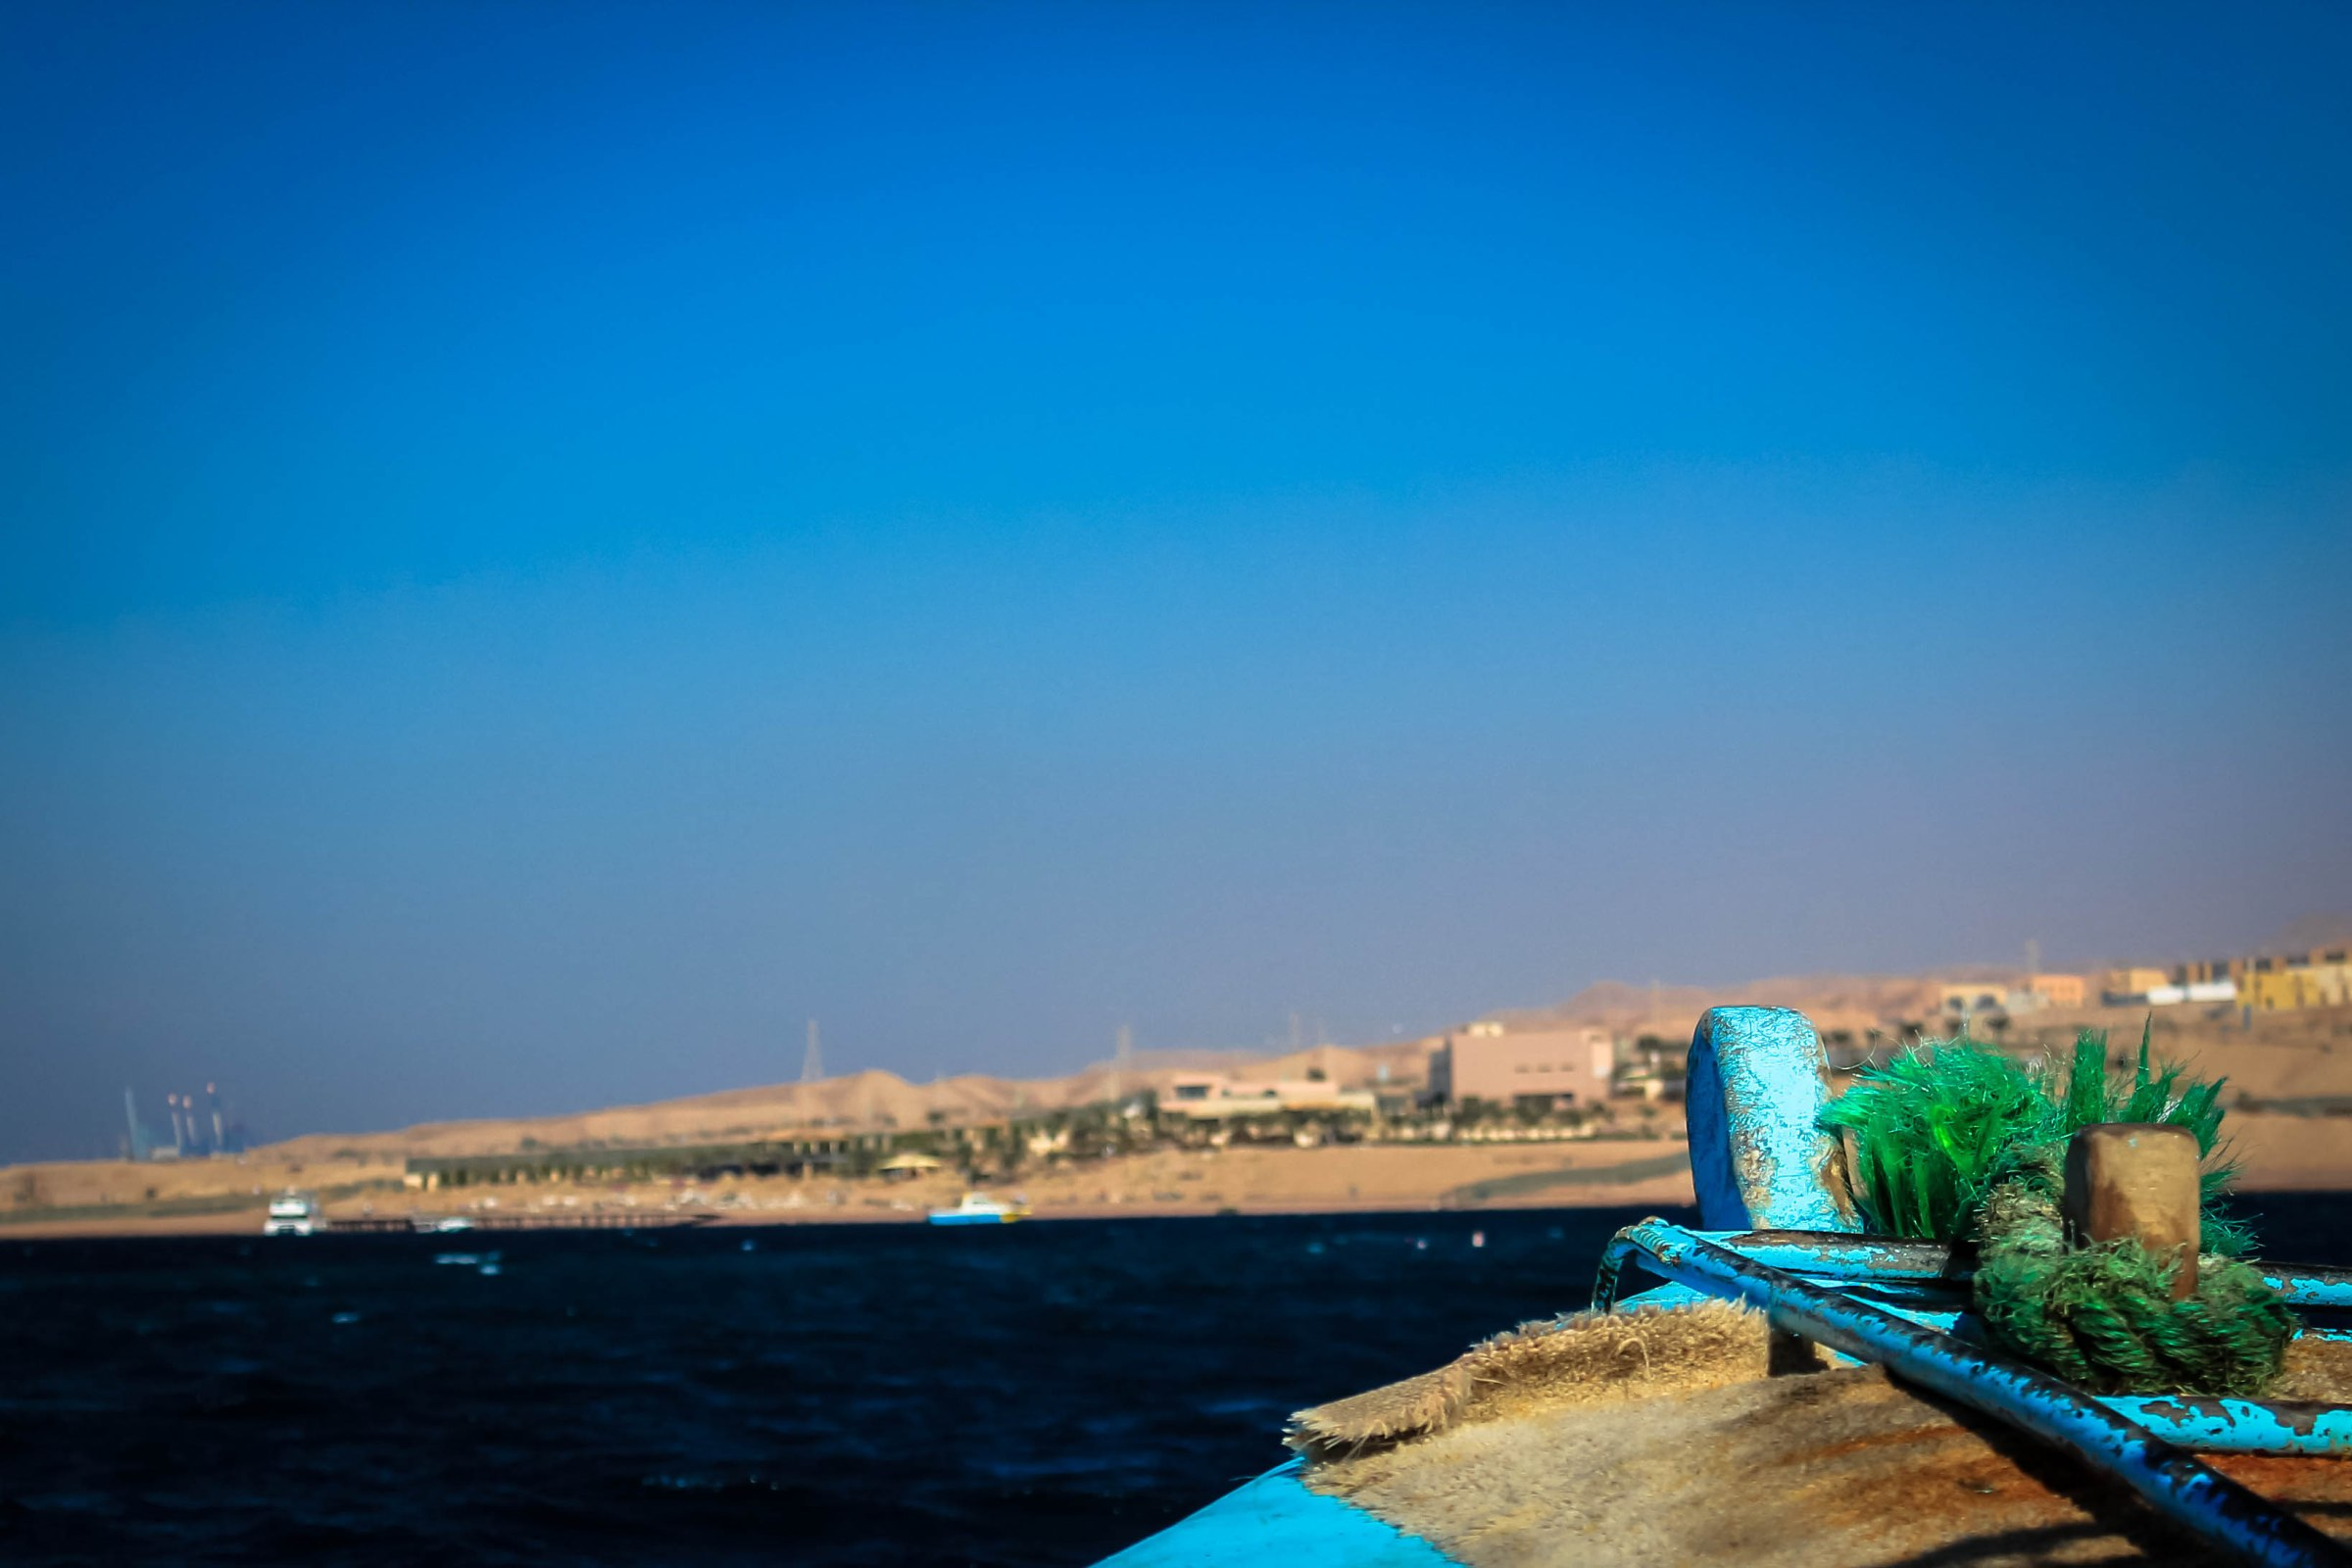 Plongée dans la Mer Rouge à Aqaba en Jordanie